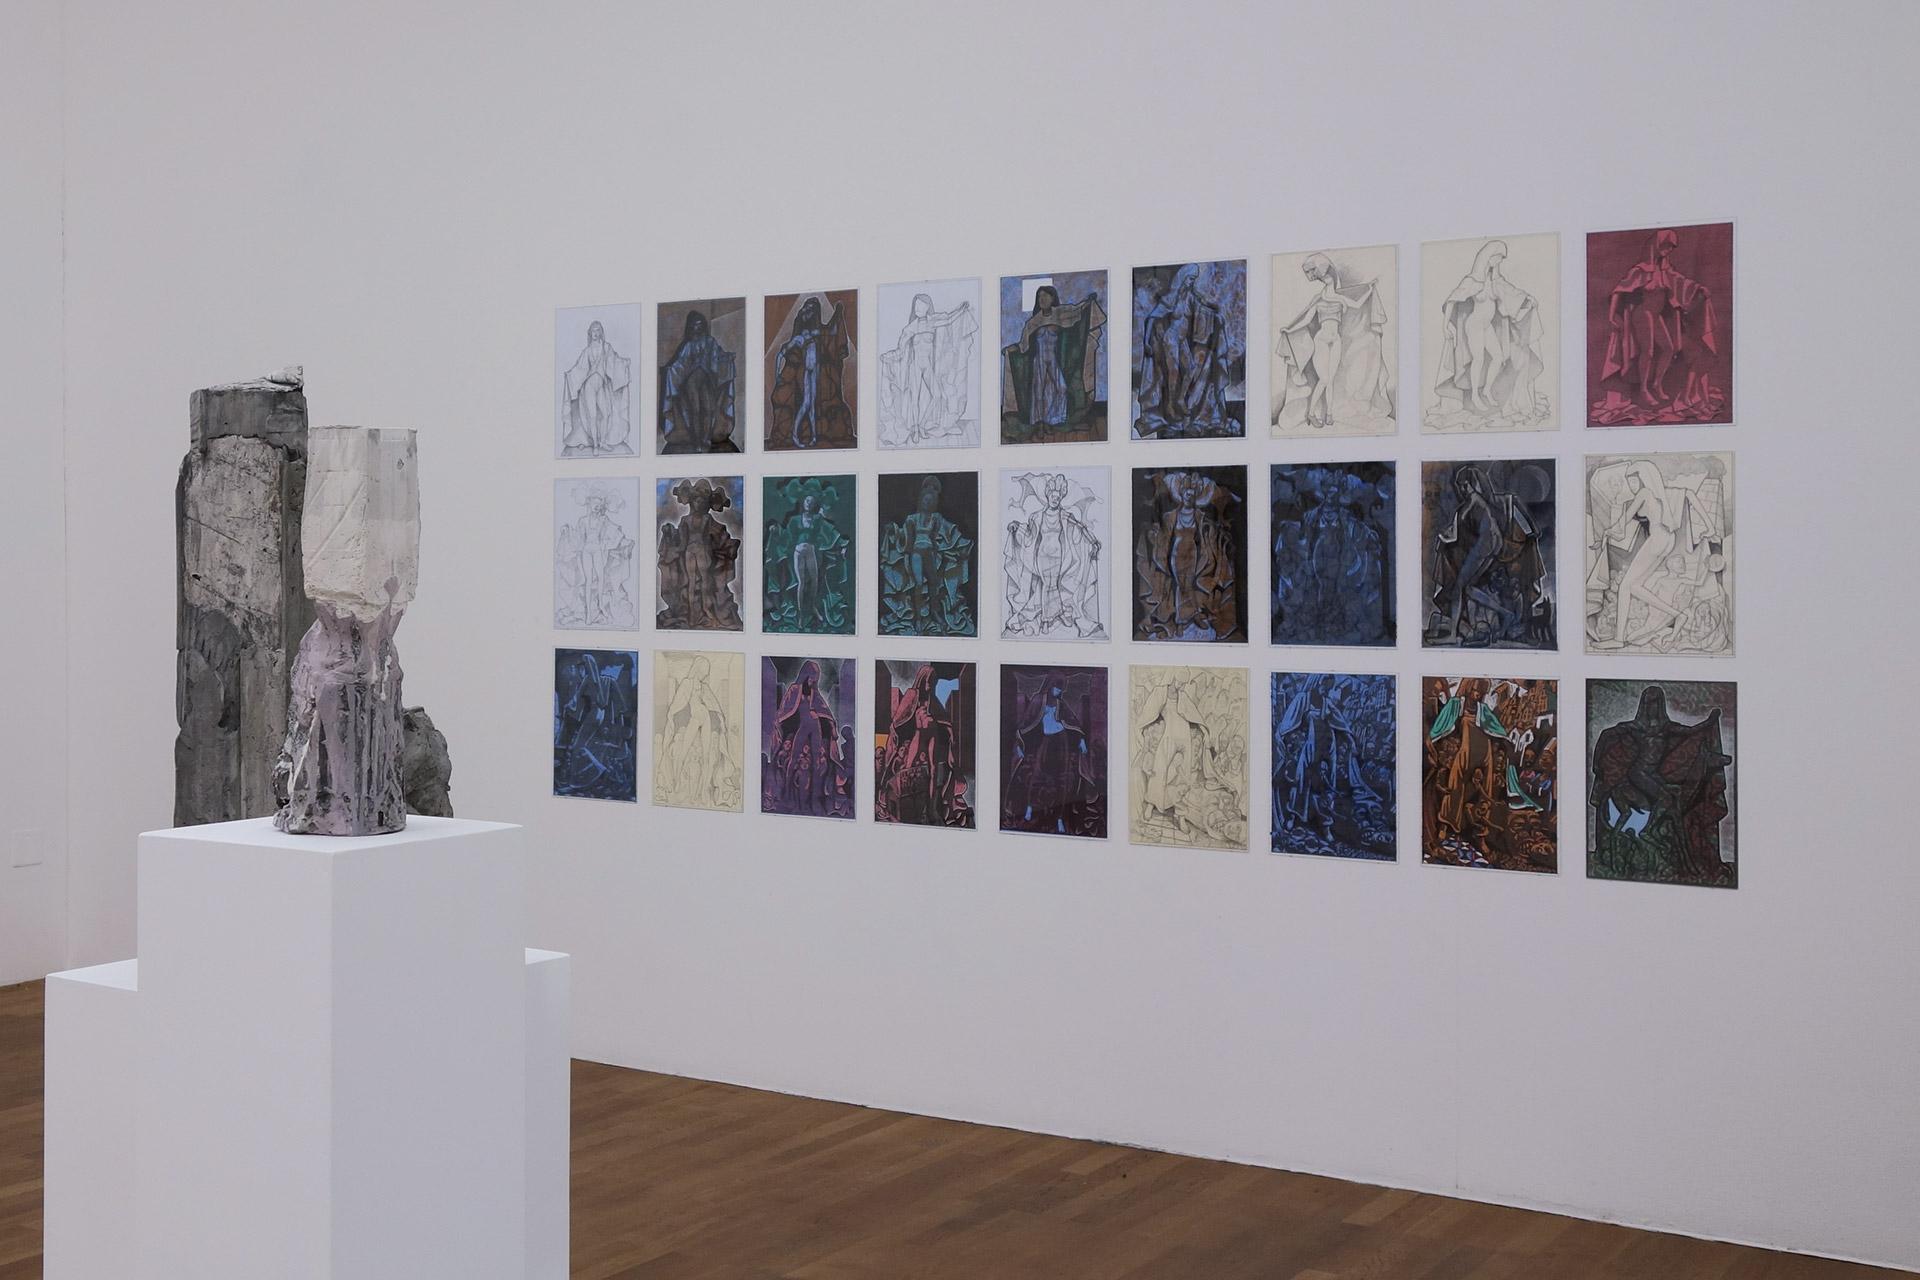 Kunsthalle-Winterthur-Dezember-Ausstellung-2017-2.jpg